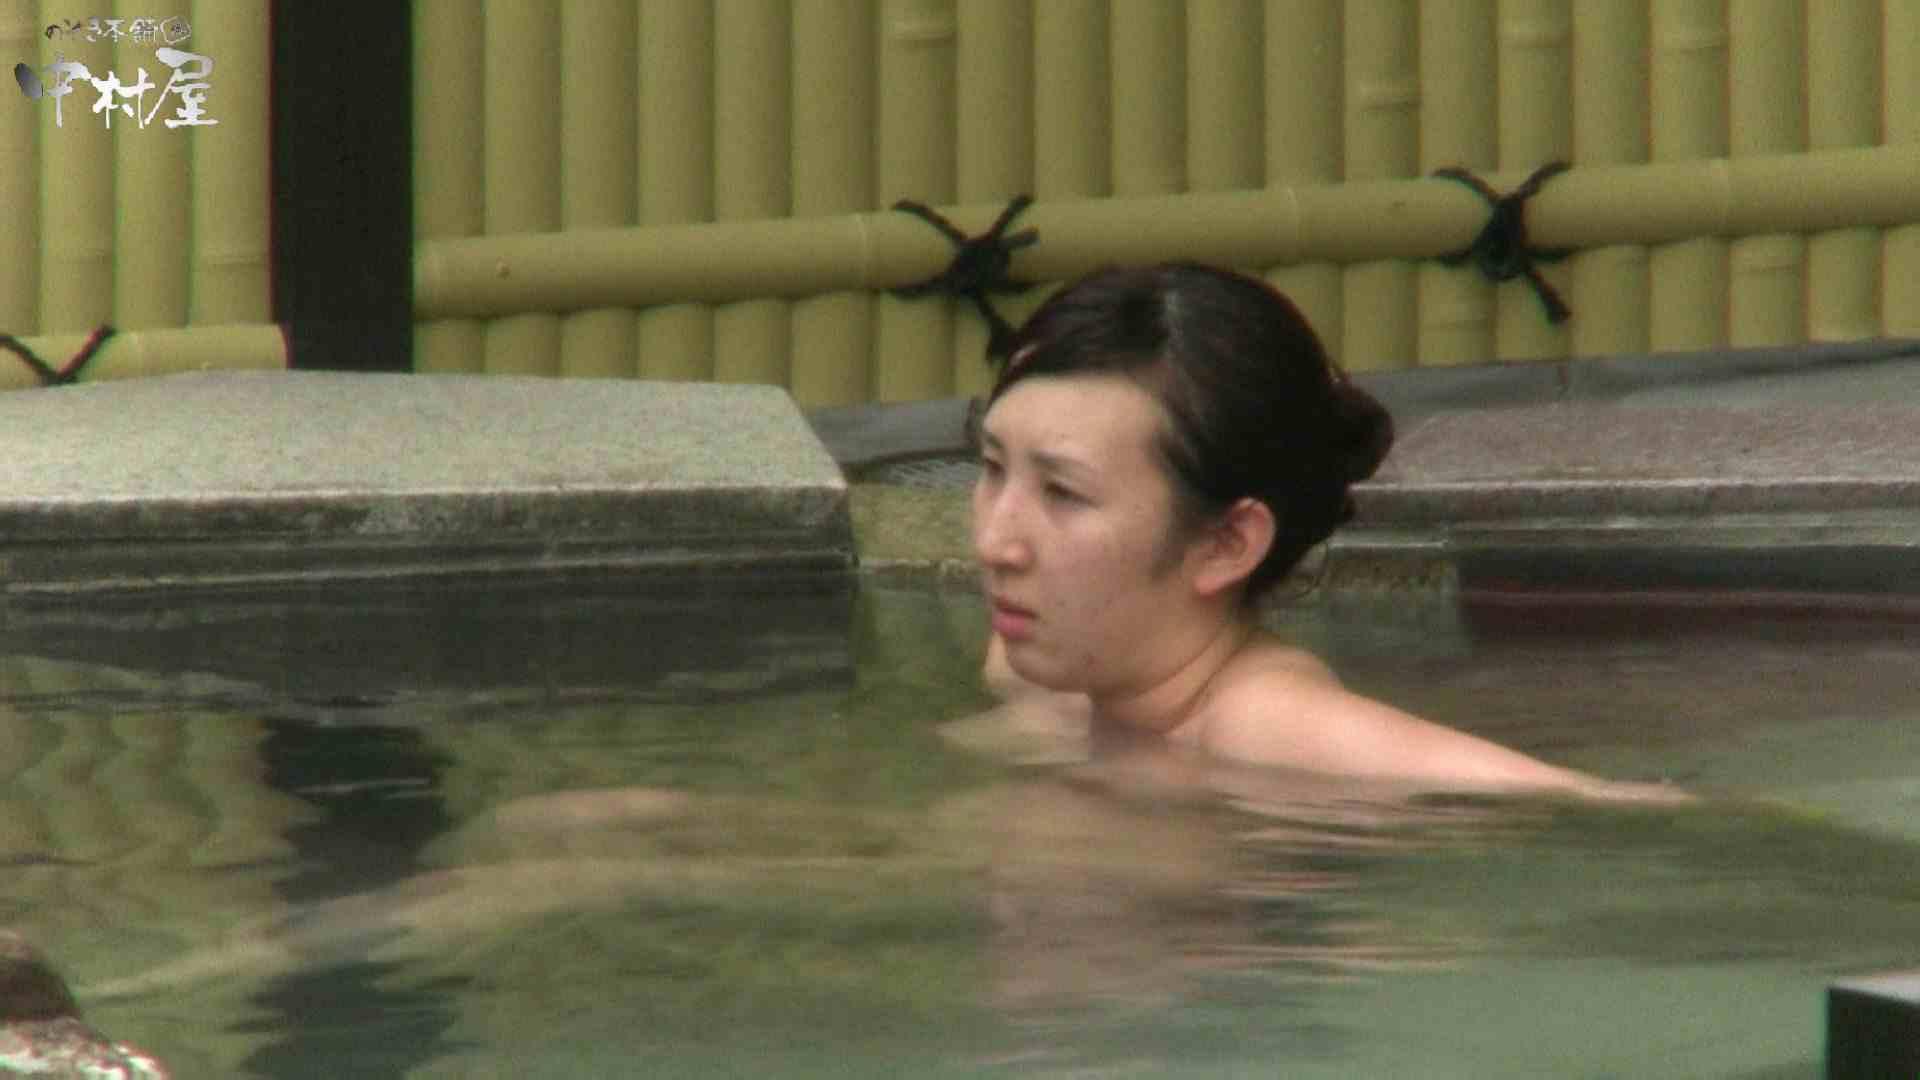 Aquaな露天風呂Vol.948 盗撮   HなOL  78pic 15